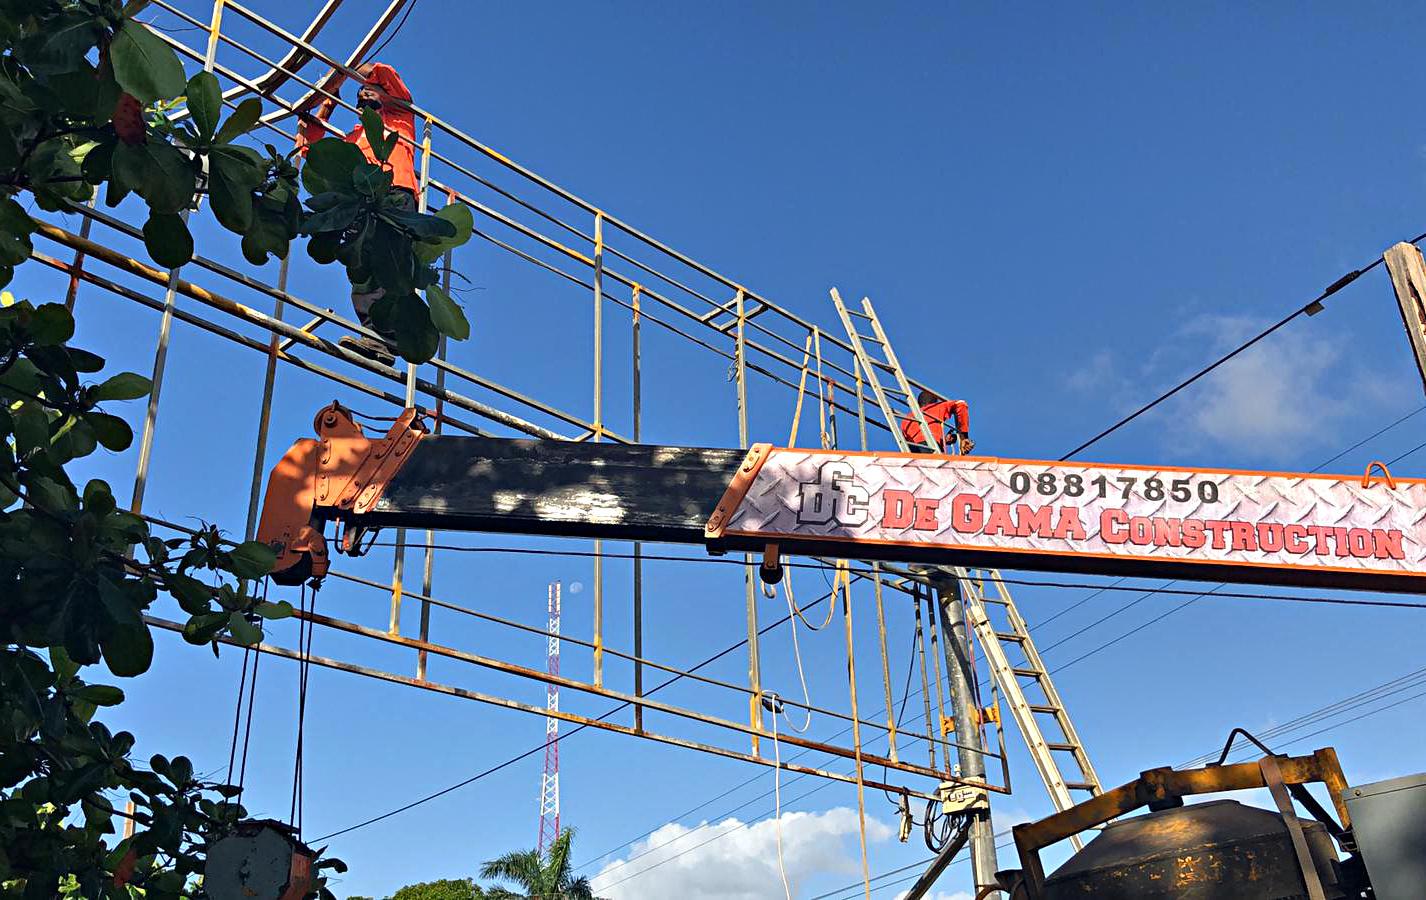 Billboard Constructie & Print Suriname